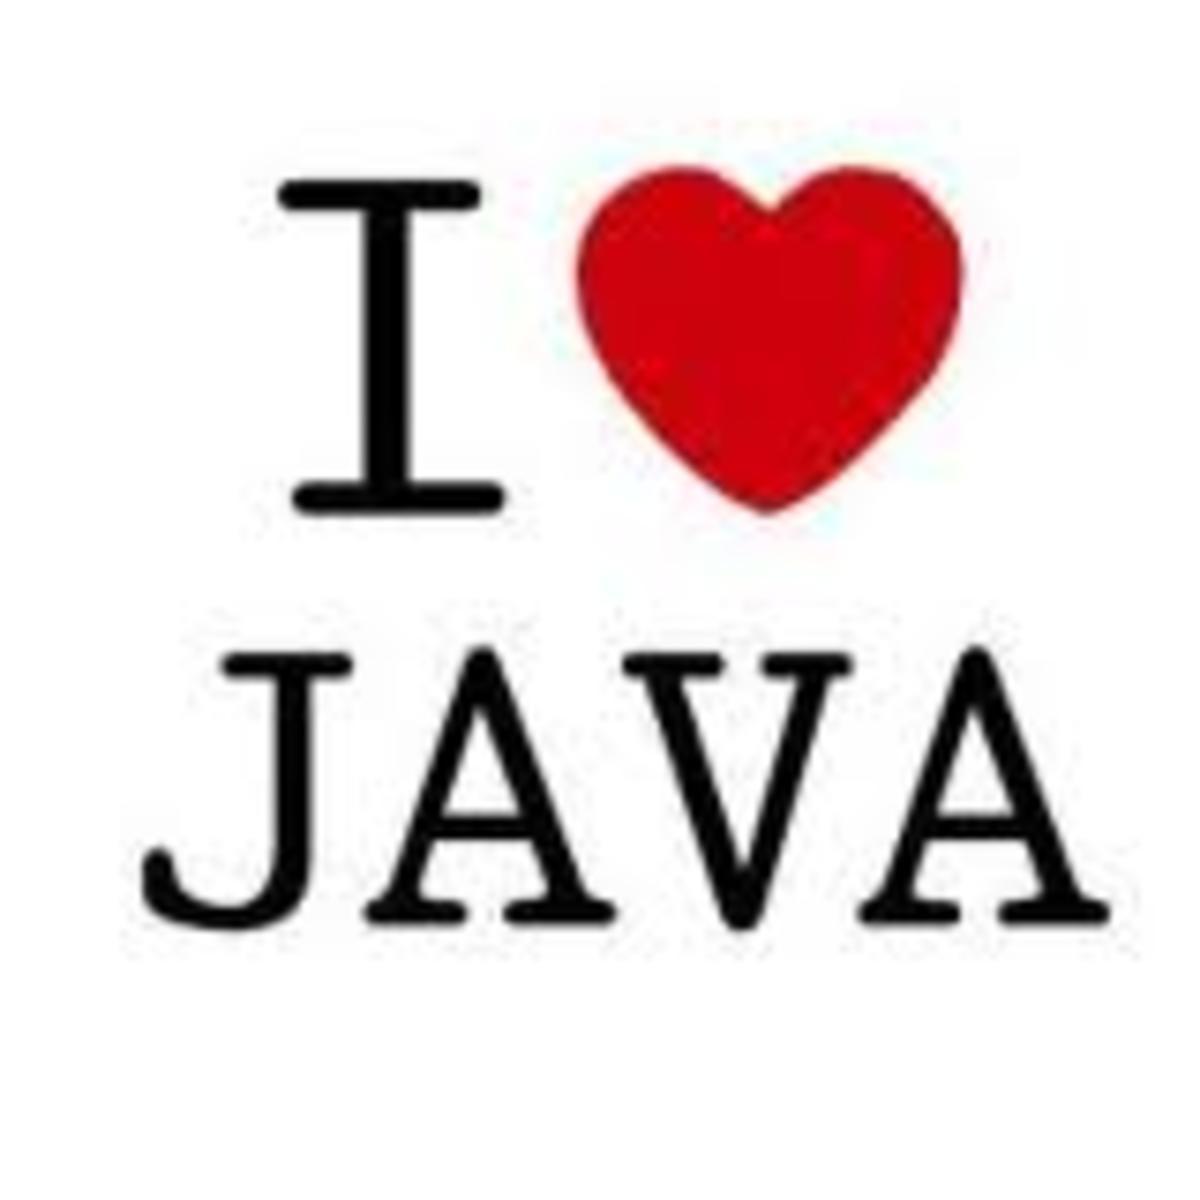 Java Source Code: A Recursive Asterisk Diamond Shape Program | HubPages